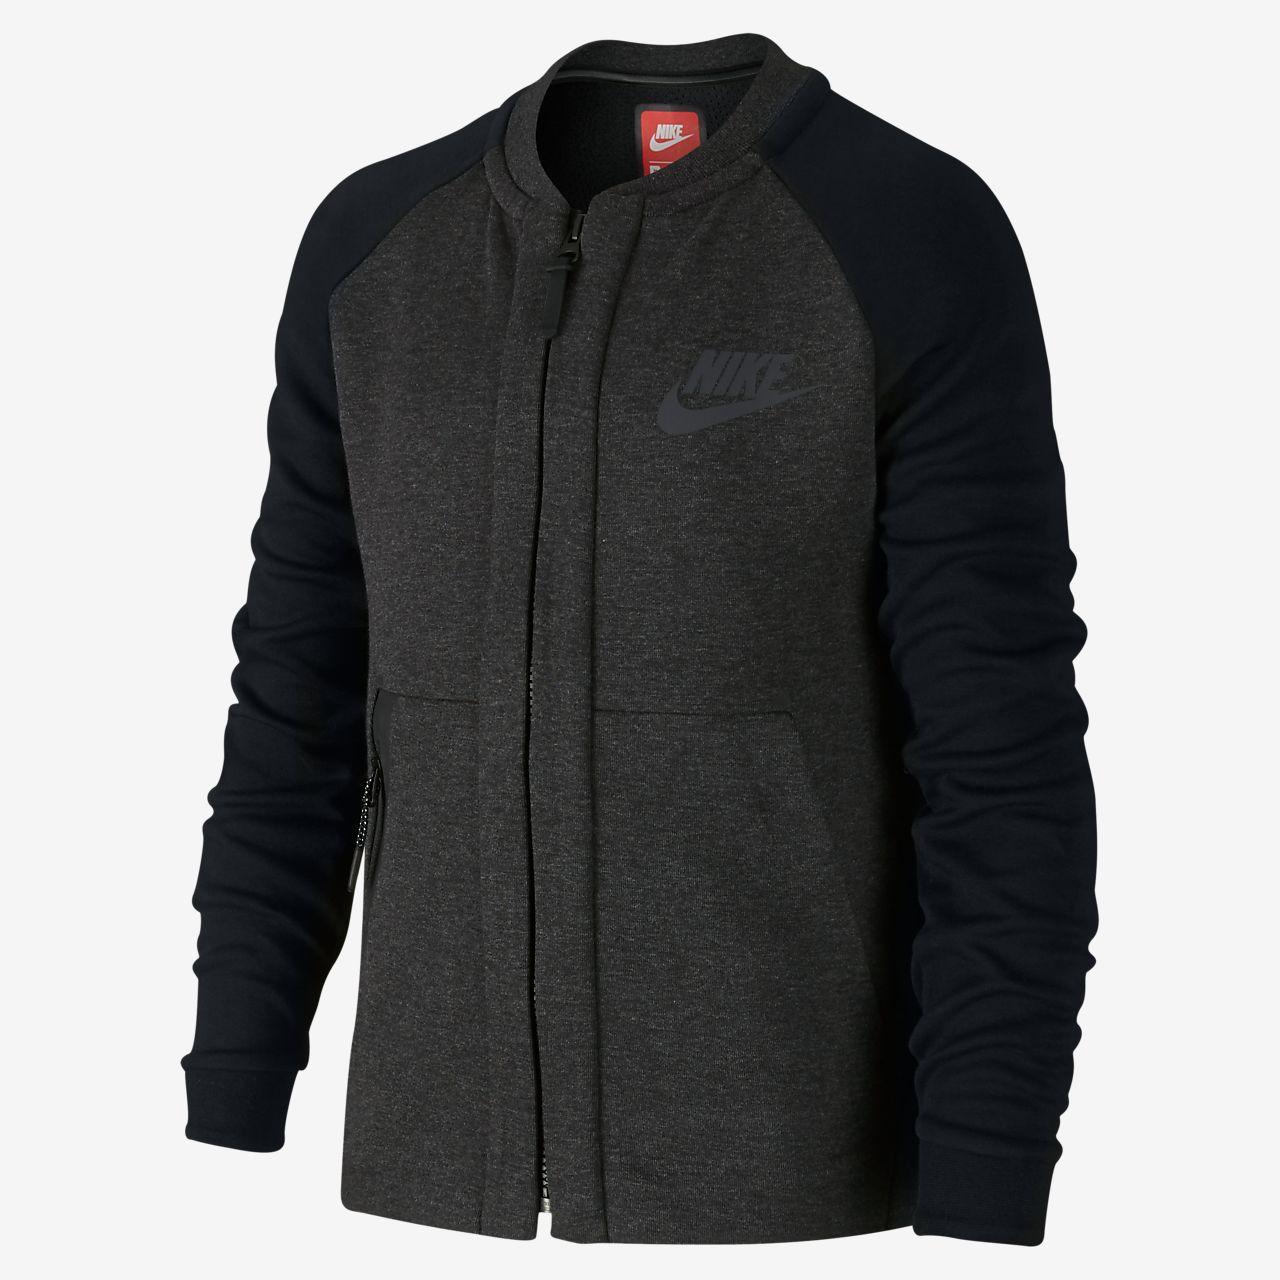 7057649d235cb Veste Nike Sportswear Tech Fleece Bomber pour Garçon plus âgé. Nike ...